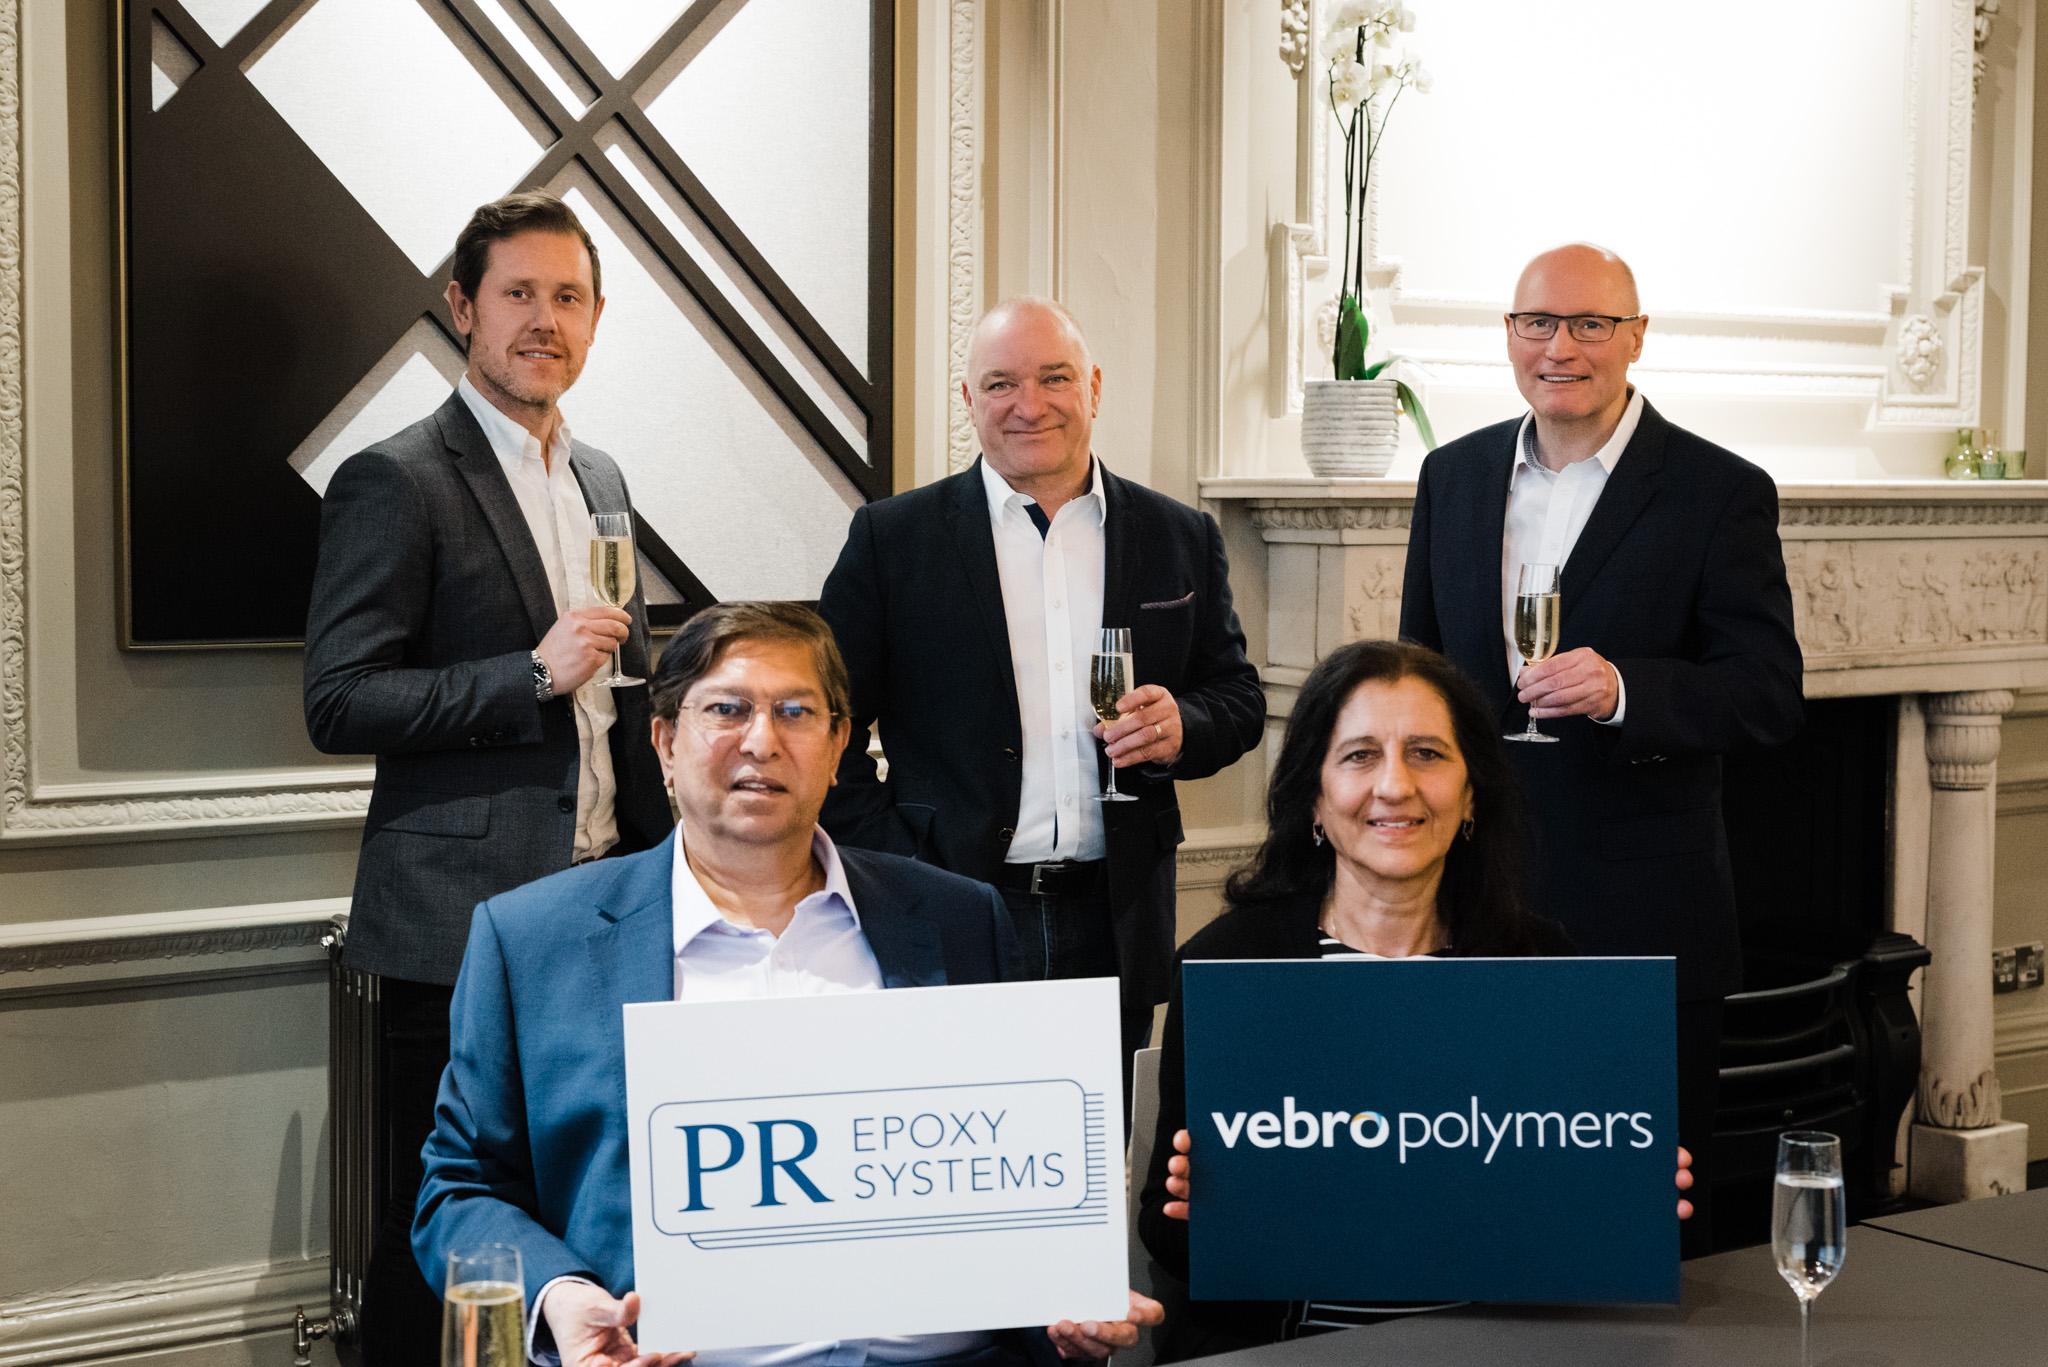 Vebro Polymers acquires PR Epoxy Systems